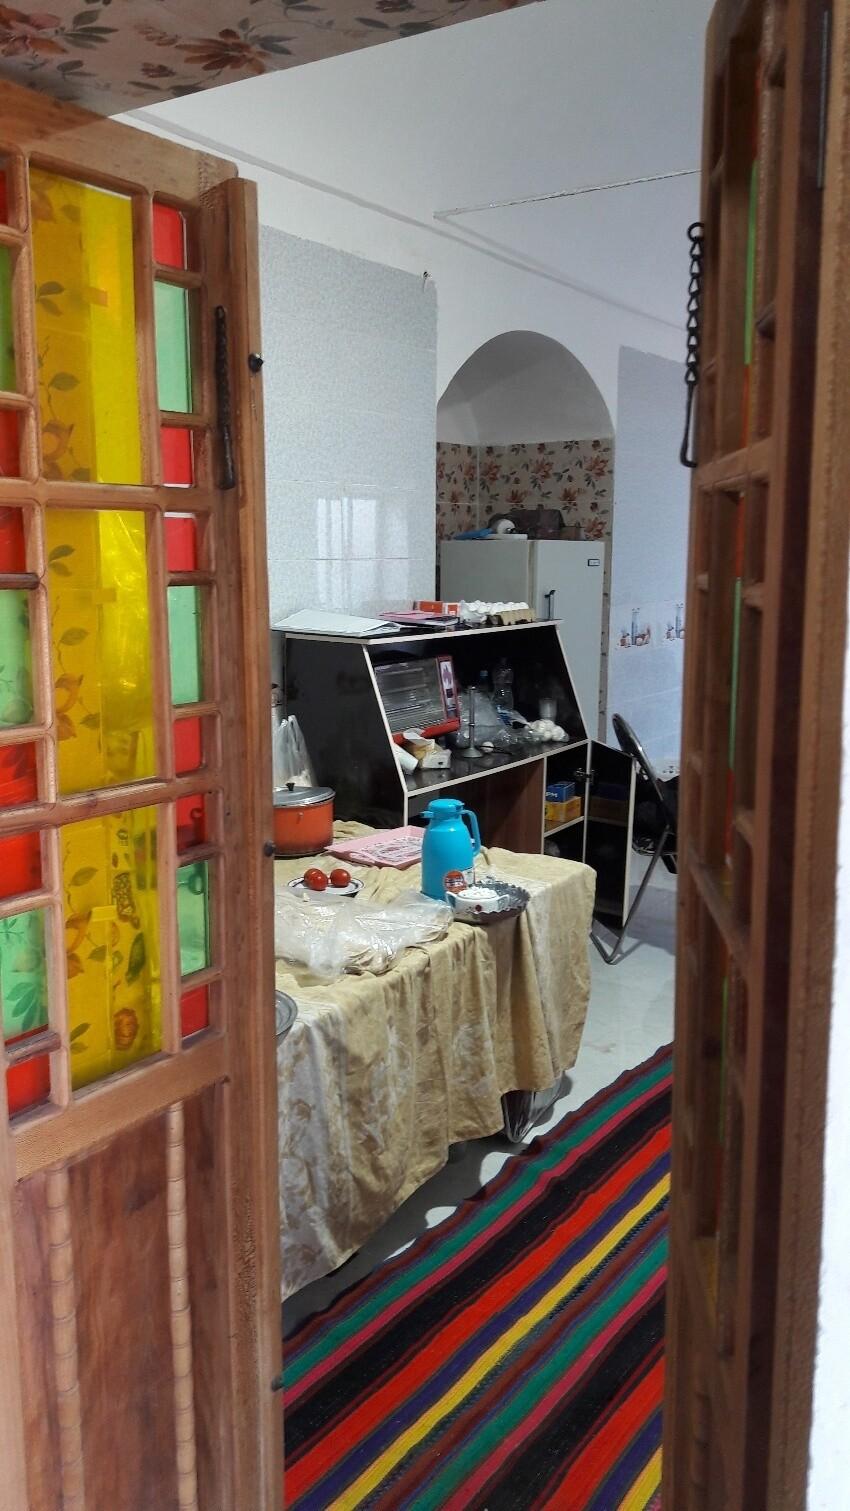 Haj Hossein Abuzid Ecological Residence in Kashan (2).jpeg